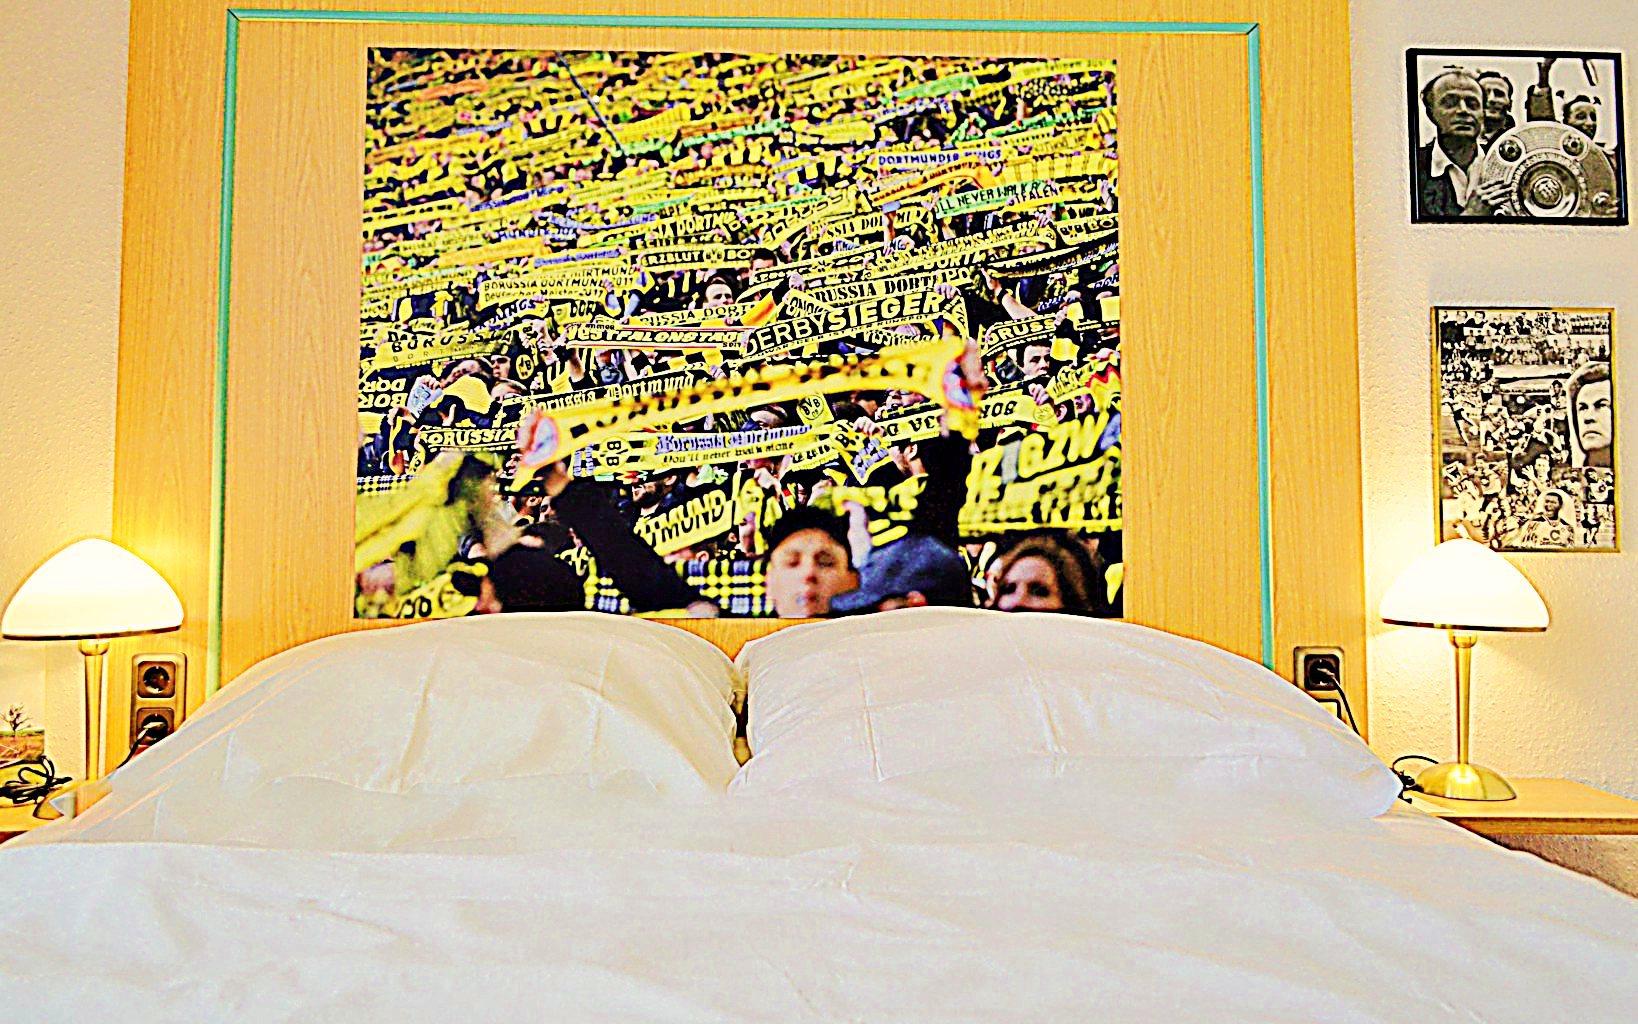 Fußball live im Signal-Iduna-Park beim BVB erleben